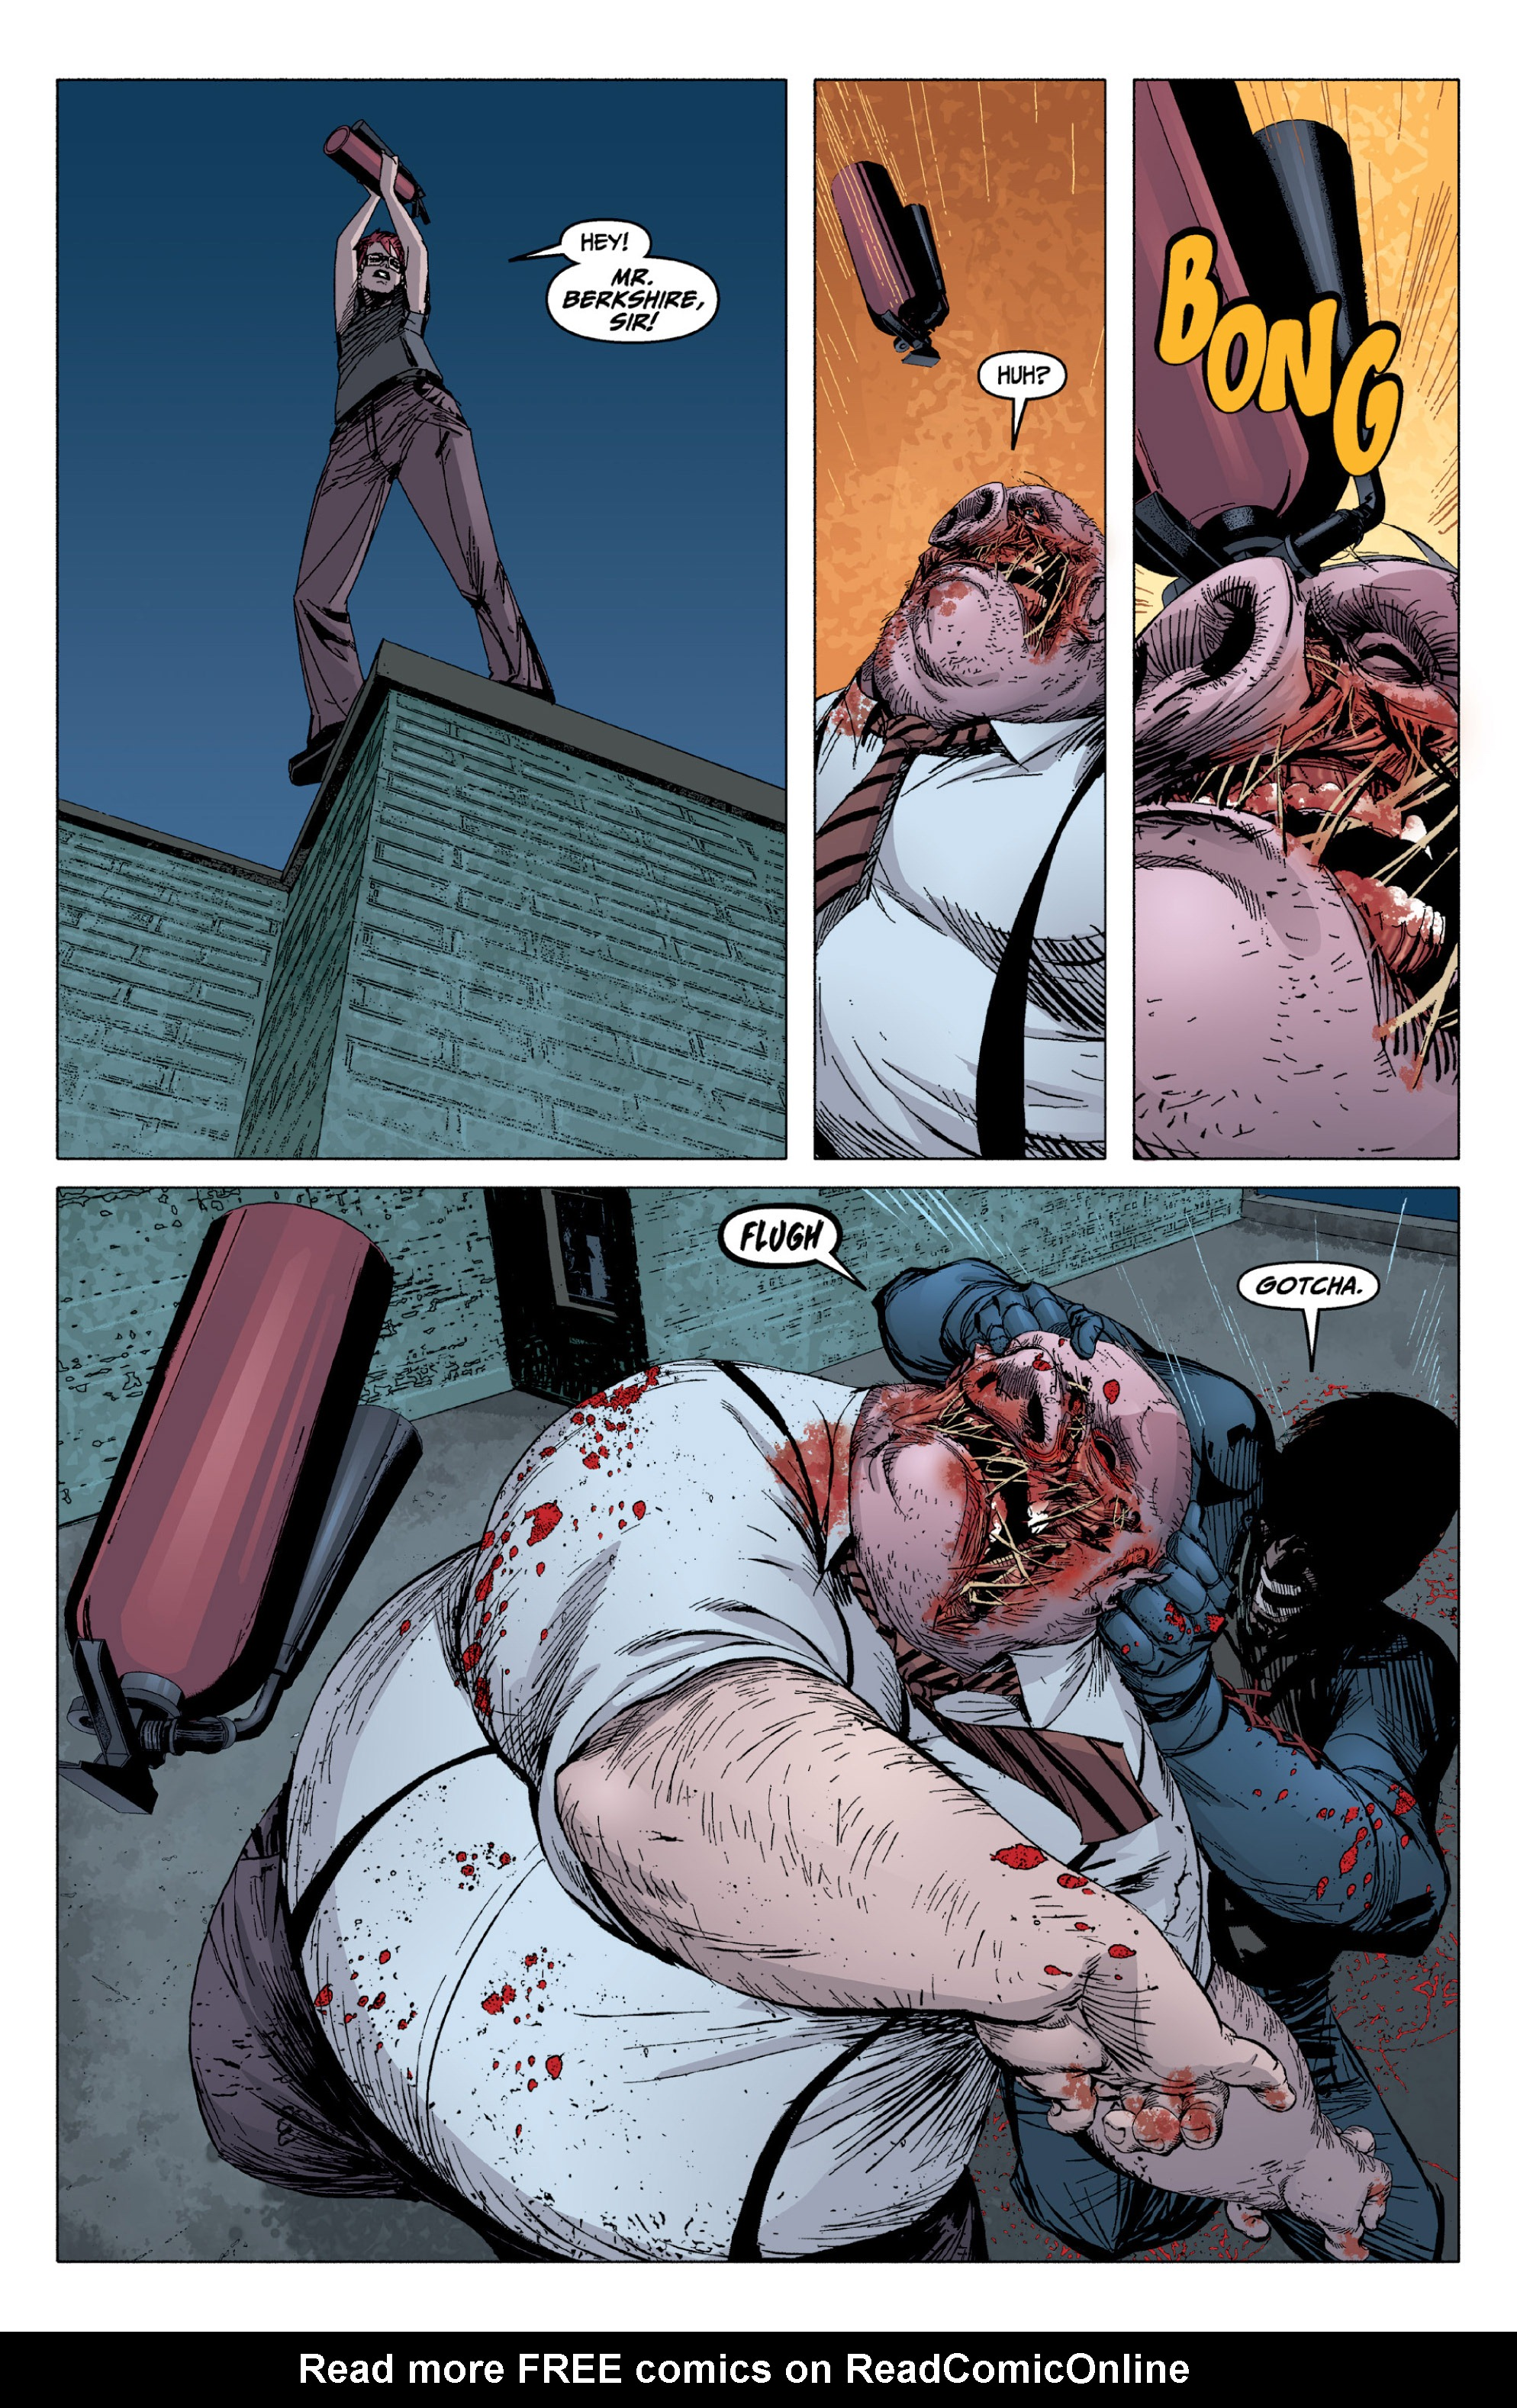 Read online X: Big Bad comic -  Issue # Full - 117